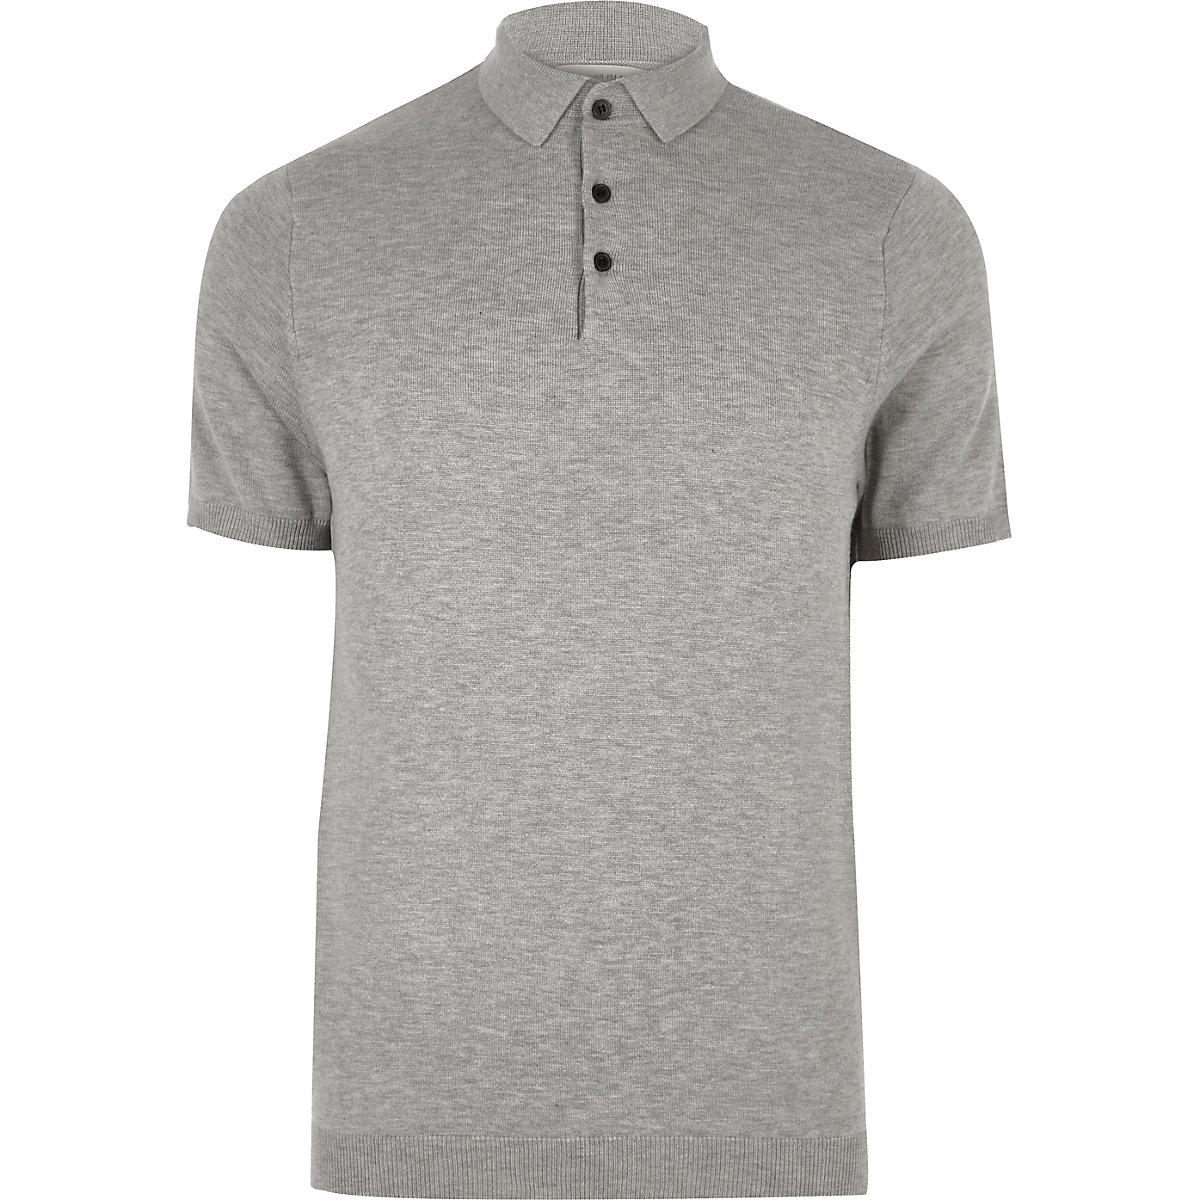 b468079abdd8f Grey slim fit polo shirt - Polo Shirts - Sale - men